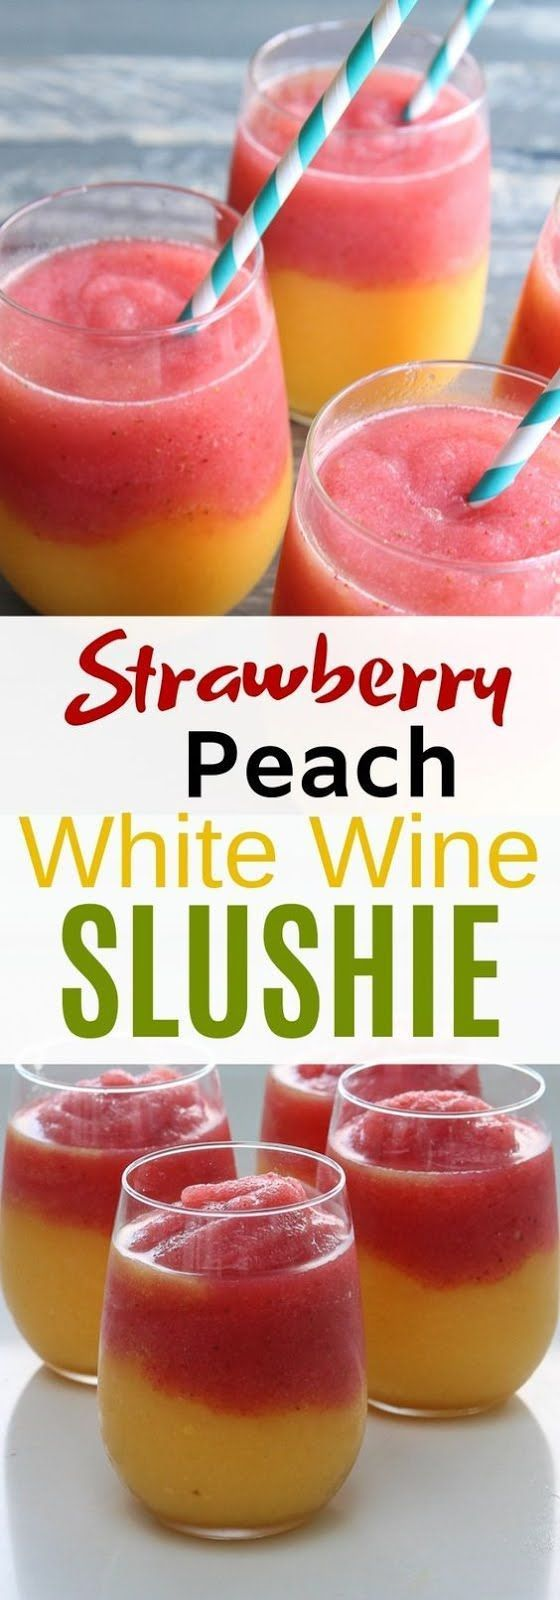 Strawberry Peach White Wine Slushie Wine Recipes Fun Easy Recipes Food